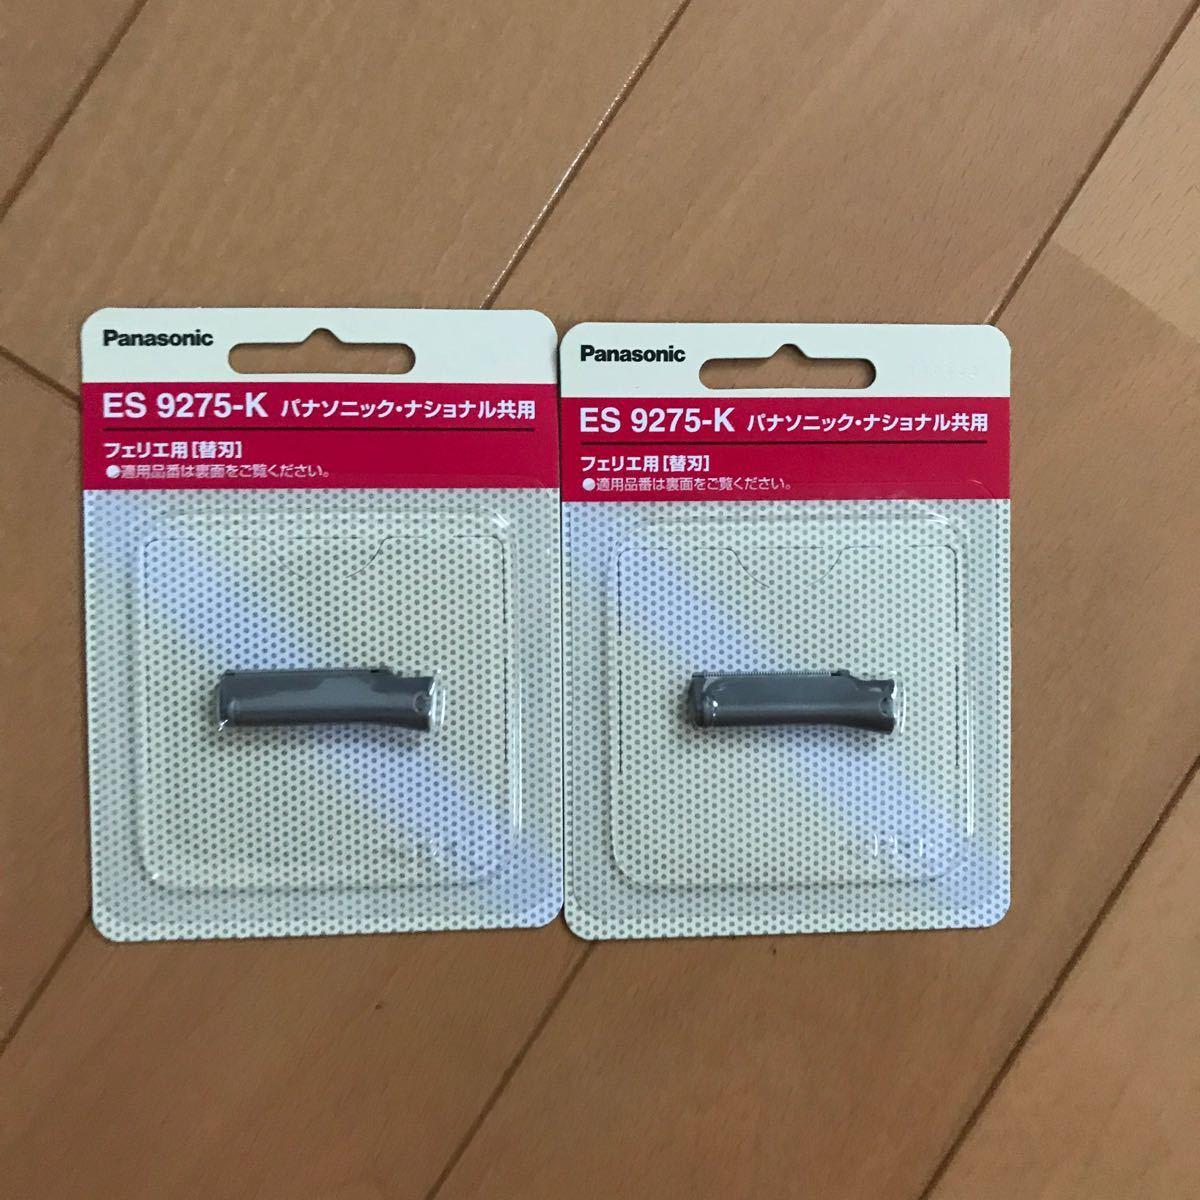 Panasonic フェイスケア別売替刃 ウブ毛用 ブラック ES9275‐K